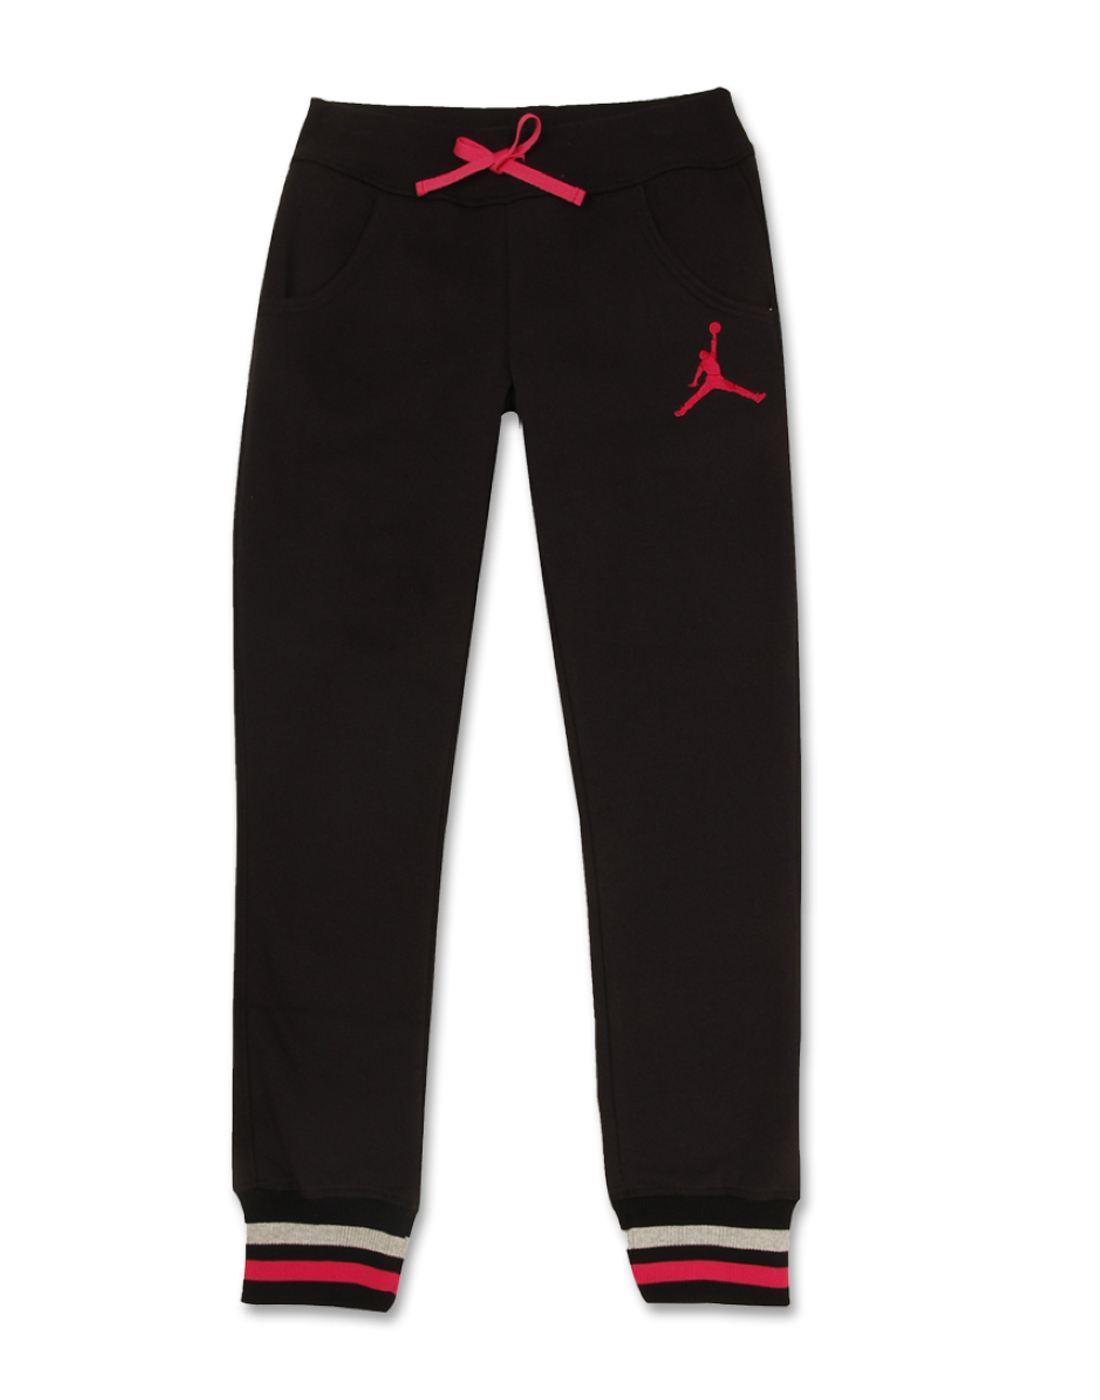 Jordan Girls Black Solid Bottom